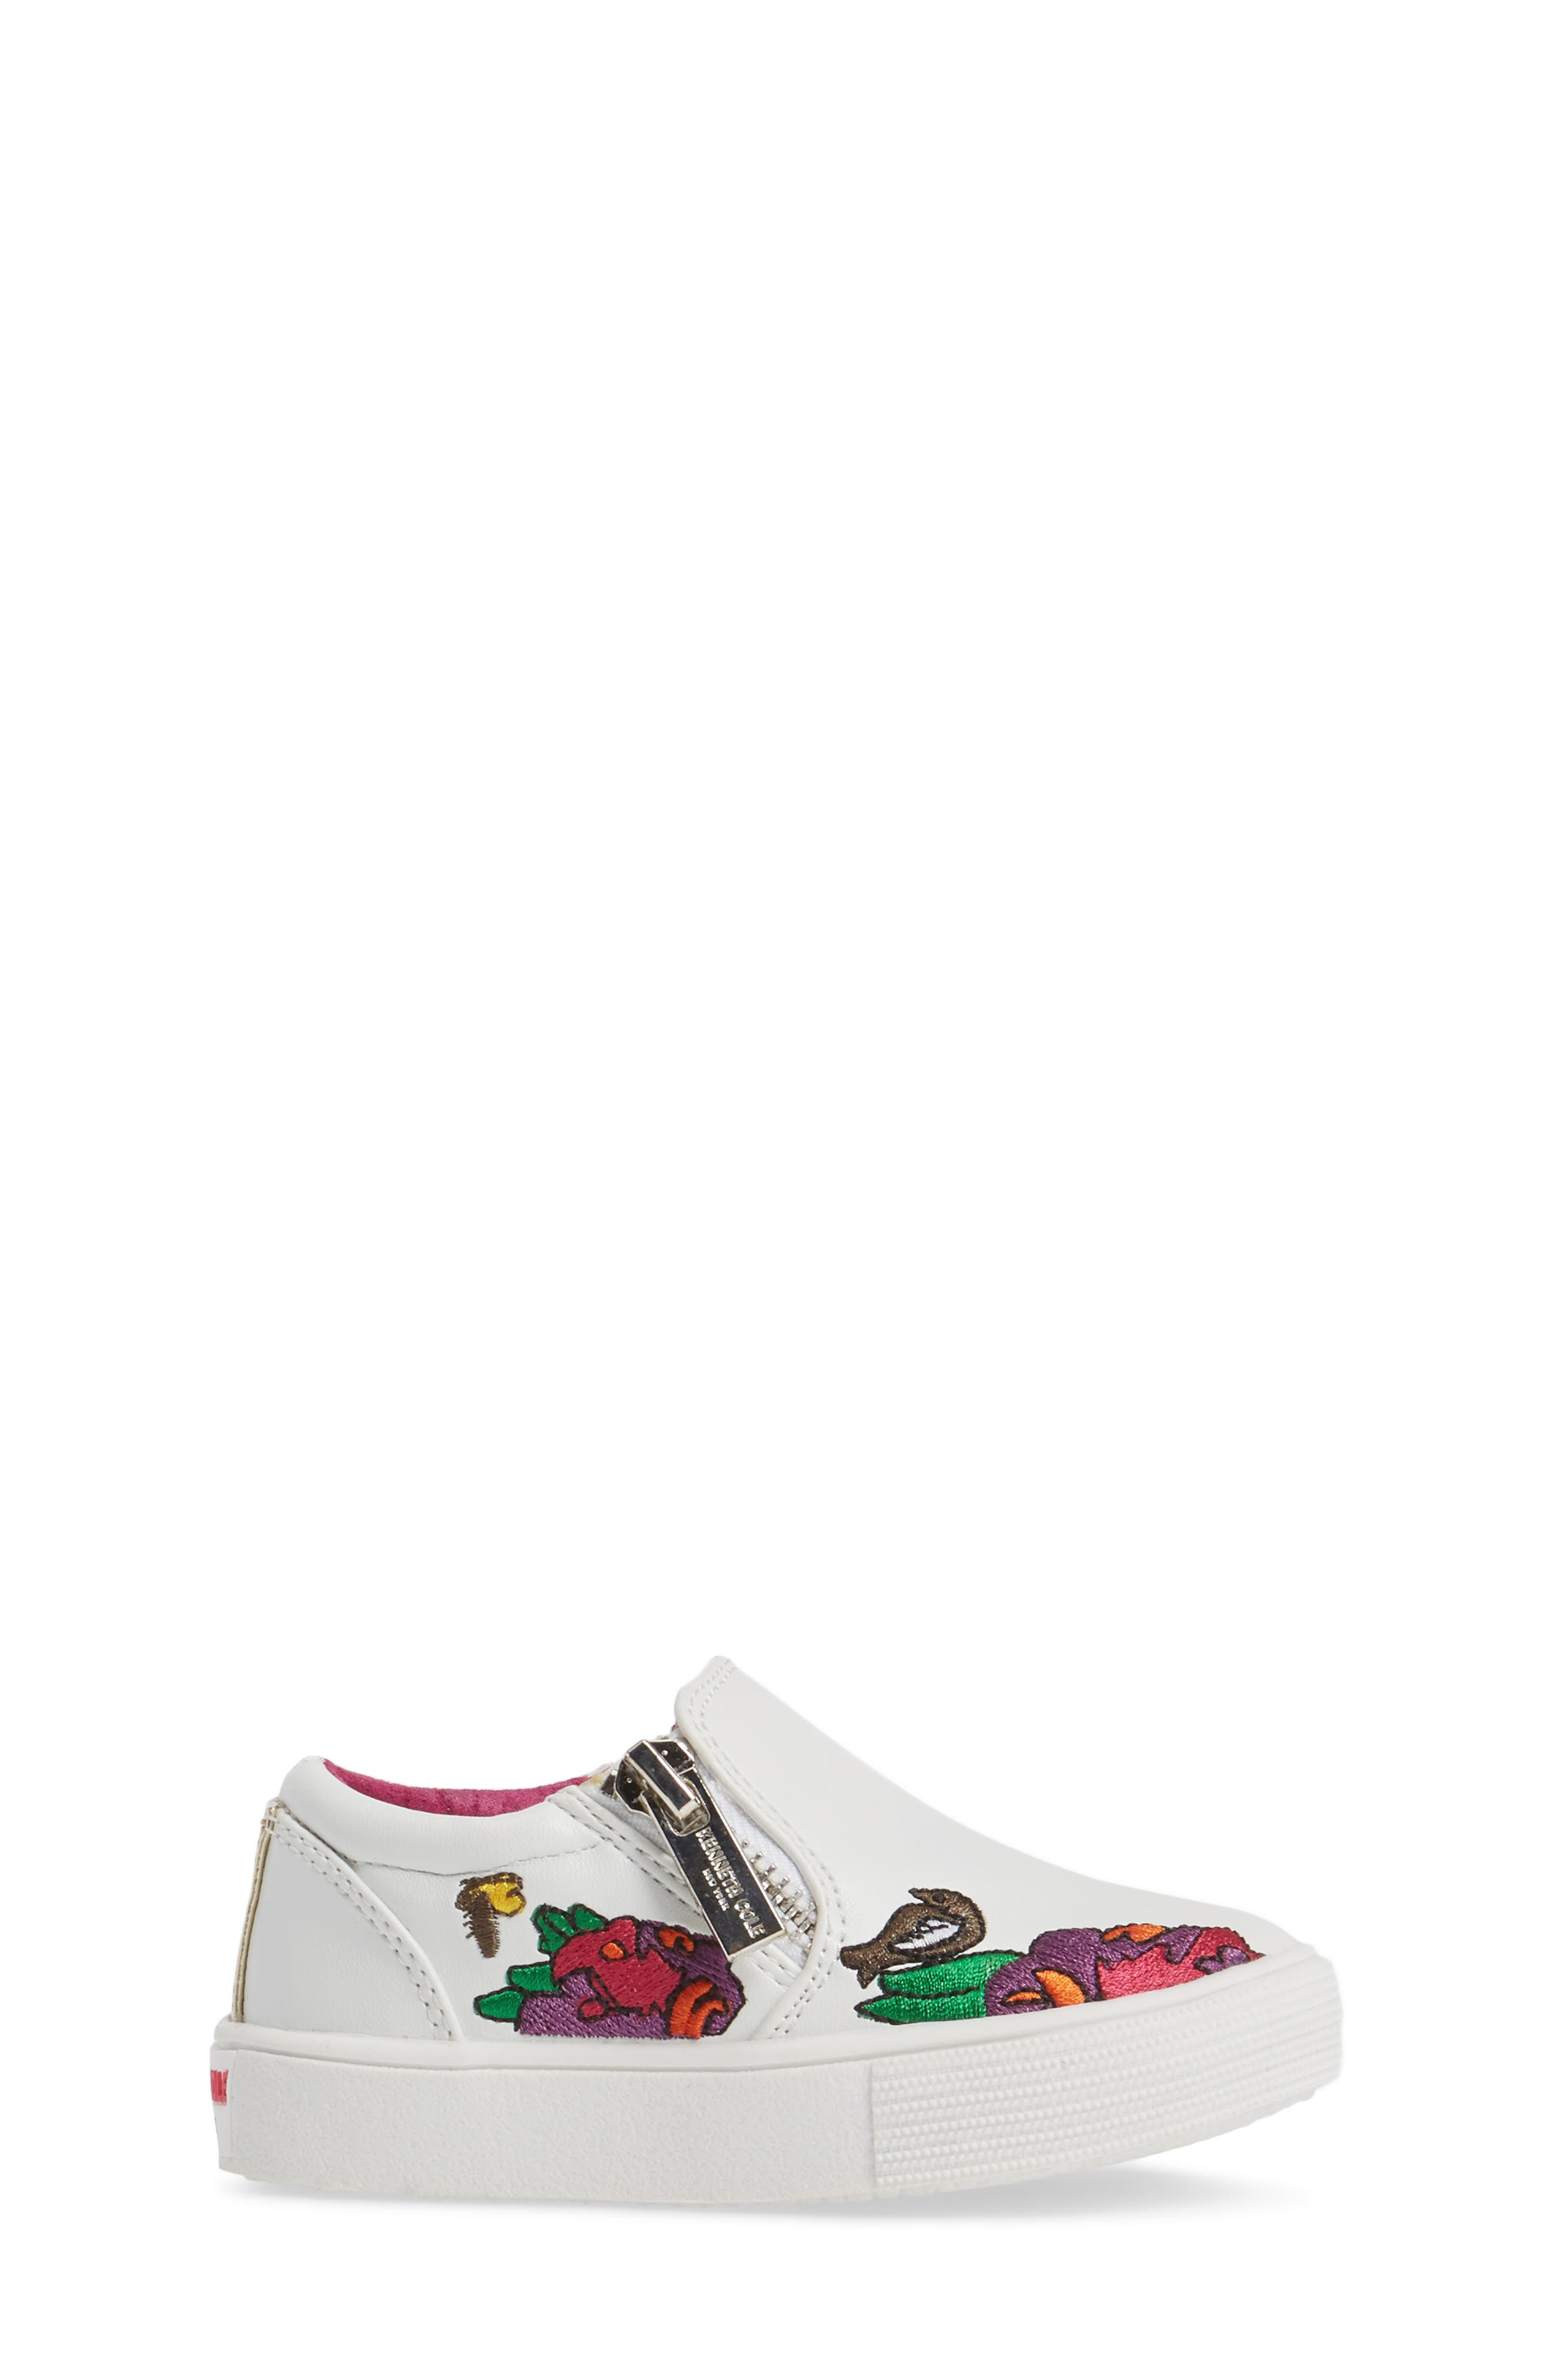 Alternate Image 3  - Kenneth Cole New York Kam Dory Embroidered Zip Sneaker (Walker & Toddler)